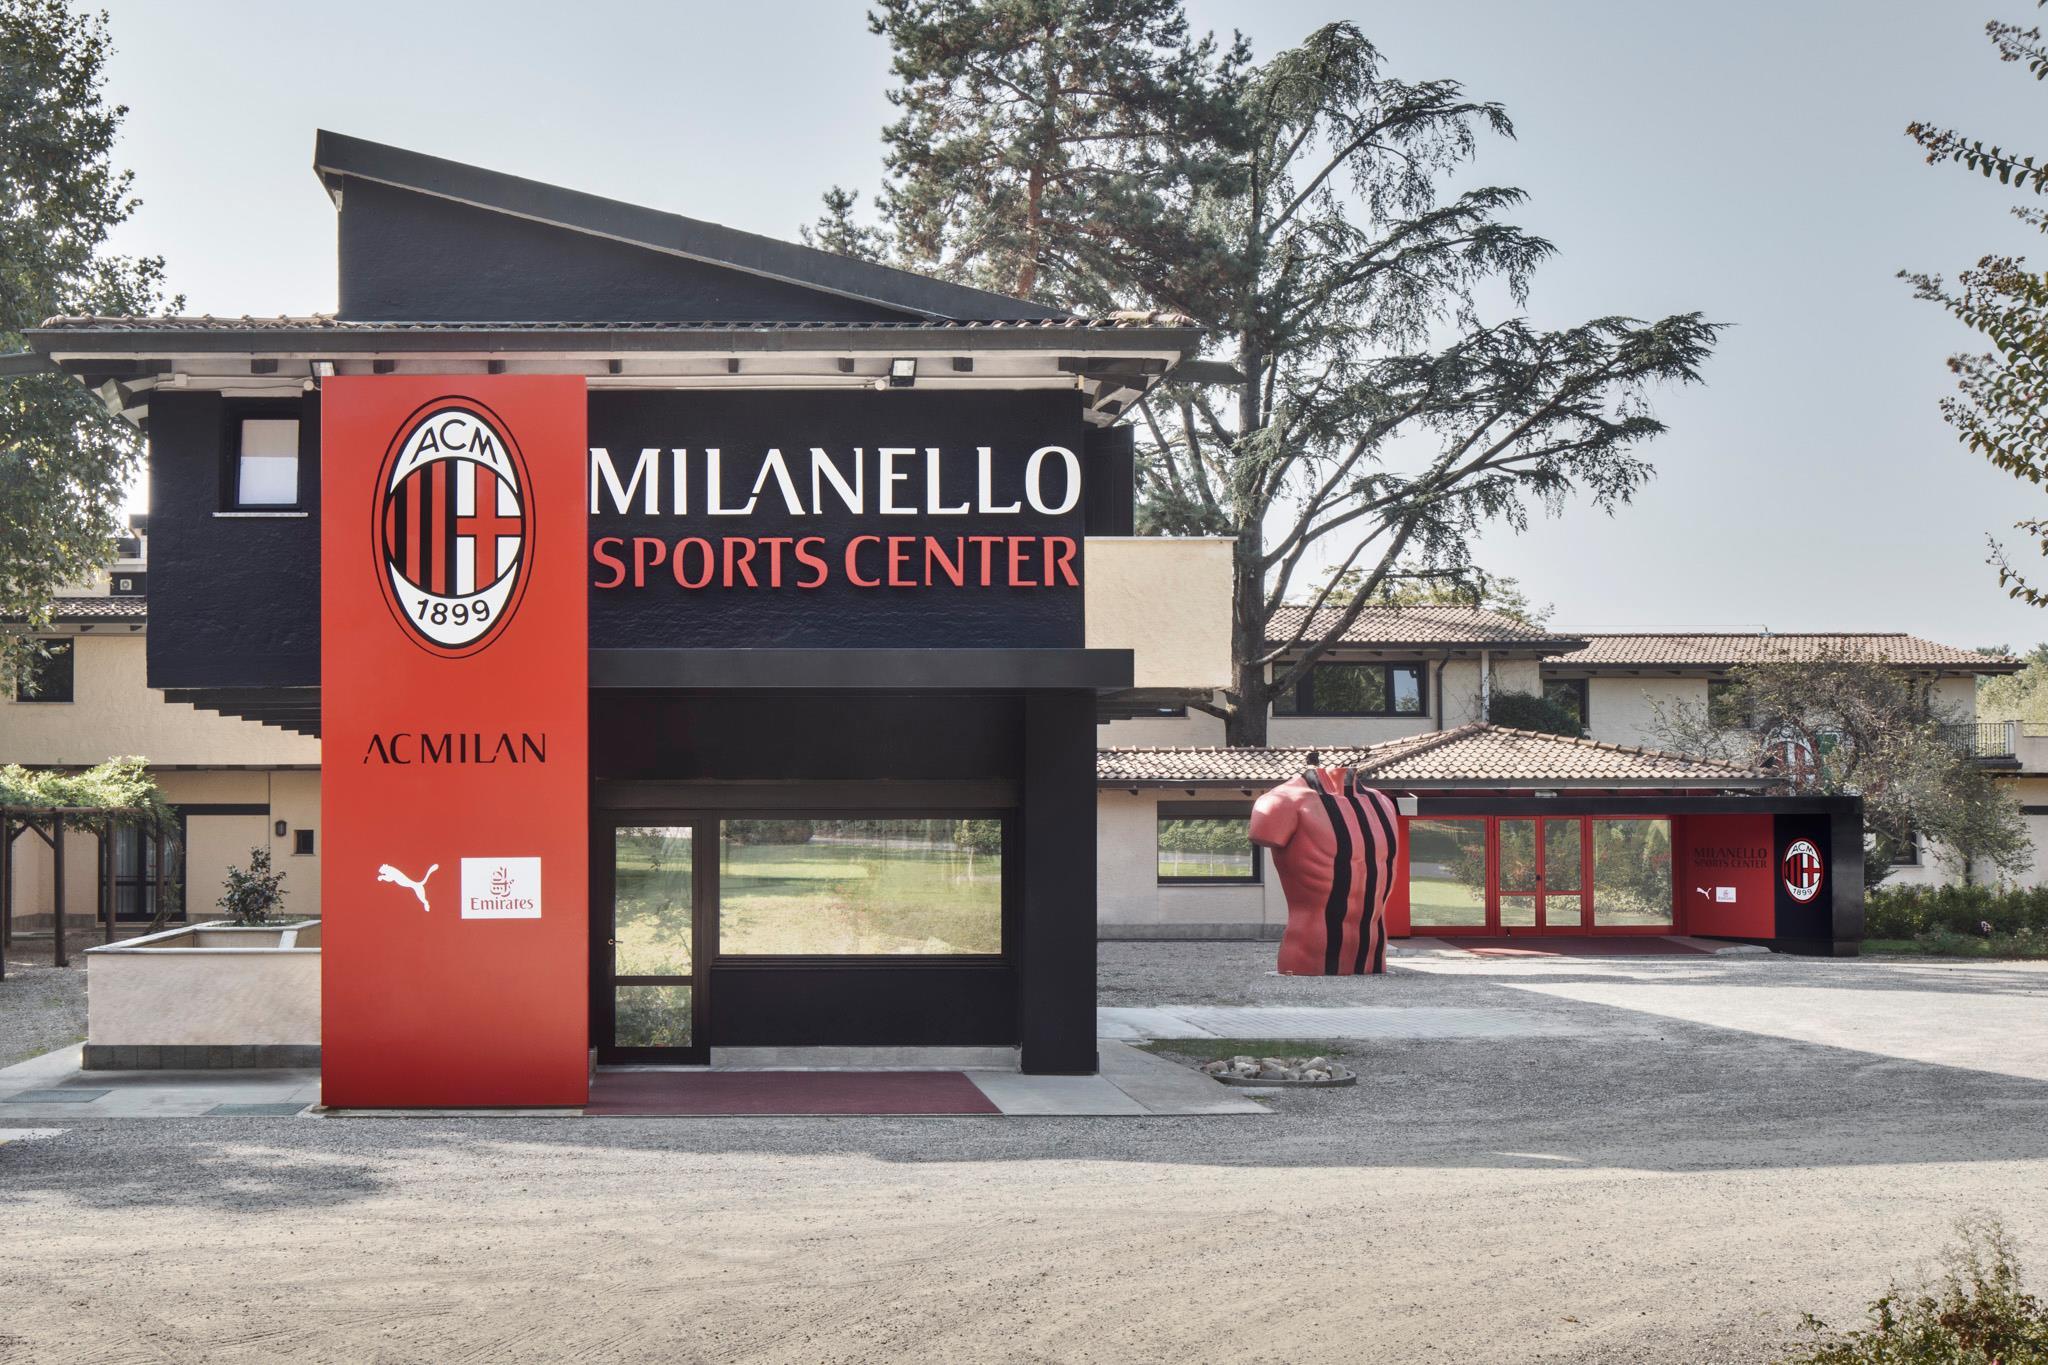 Centro Sportivo Milanello | Milan Wiki | FANDOM powered by